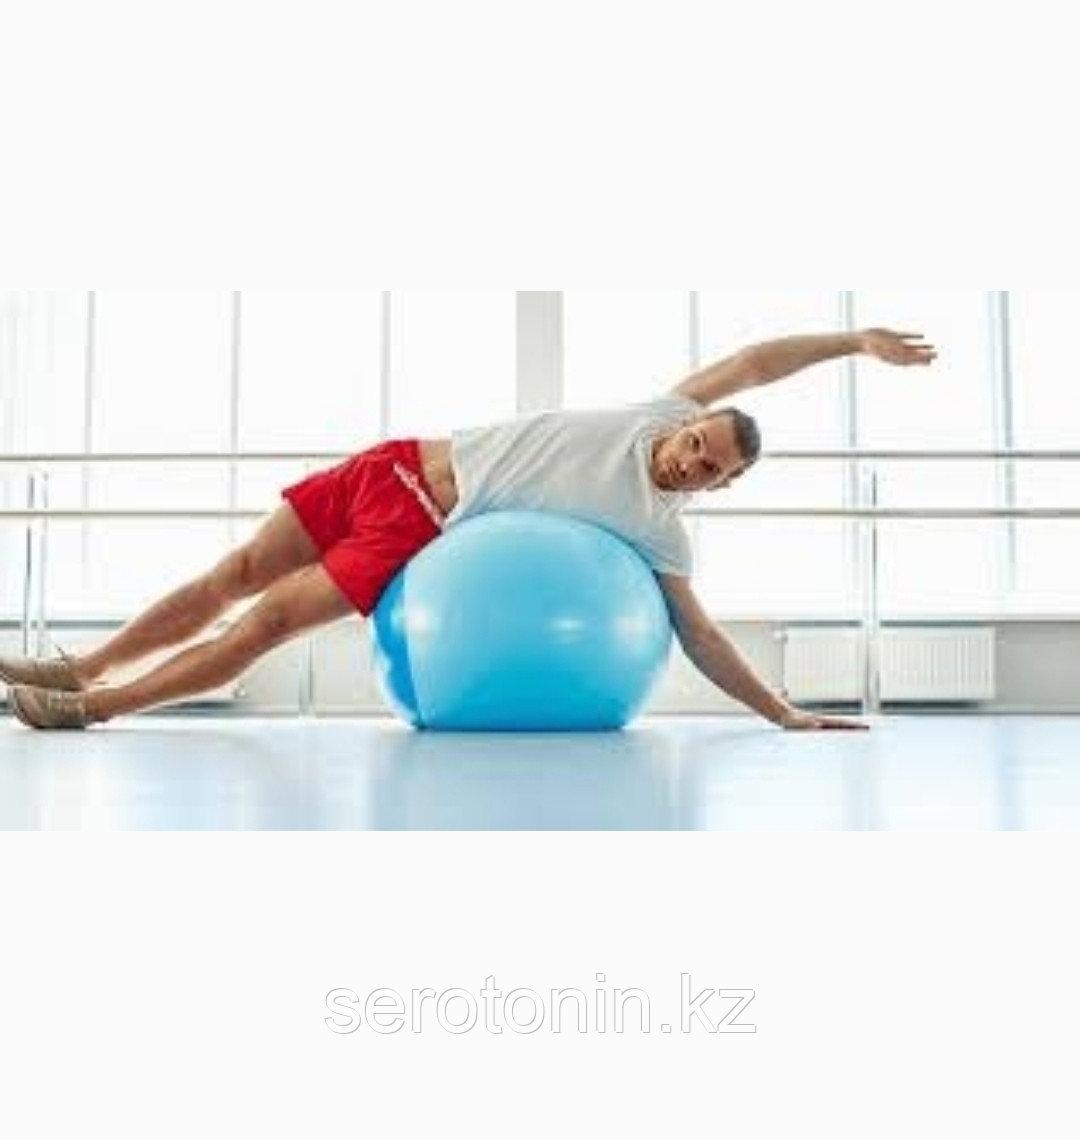 Мяч гимнастический (Фитбол) 75 см - фото 5